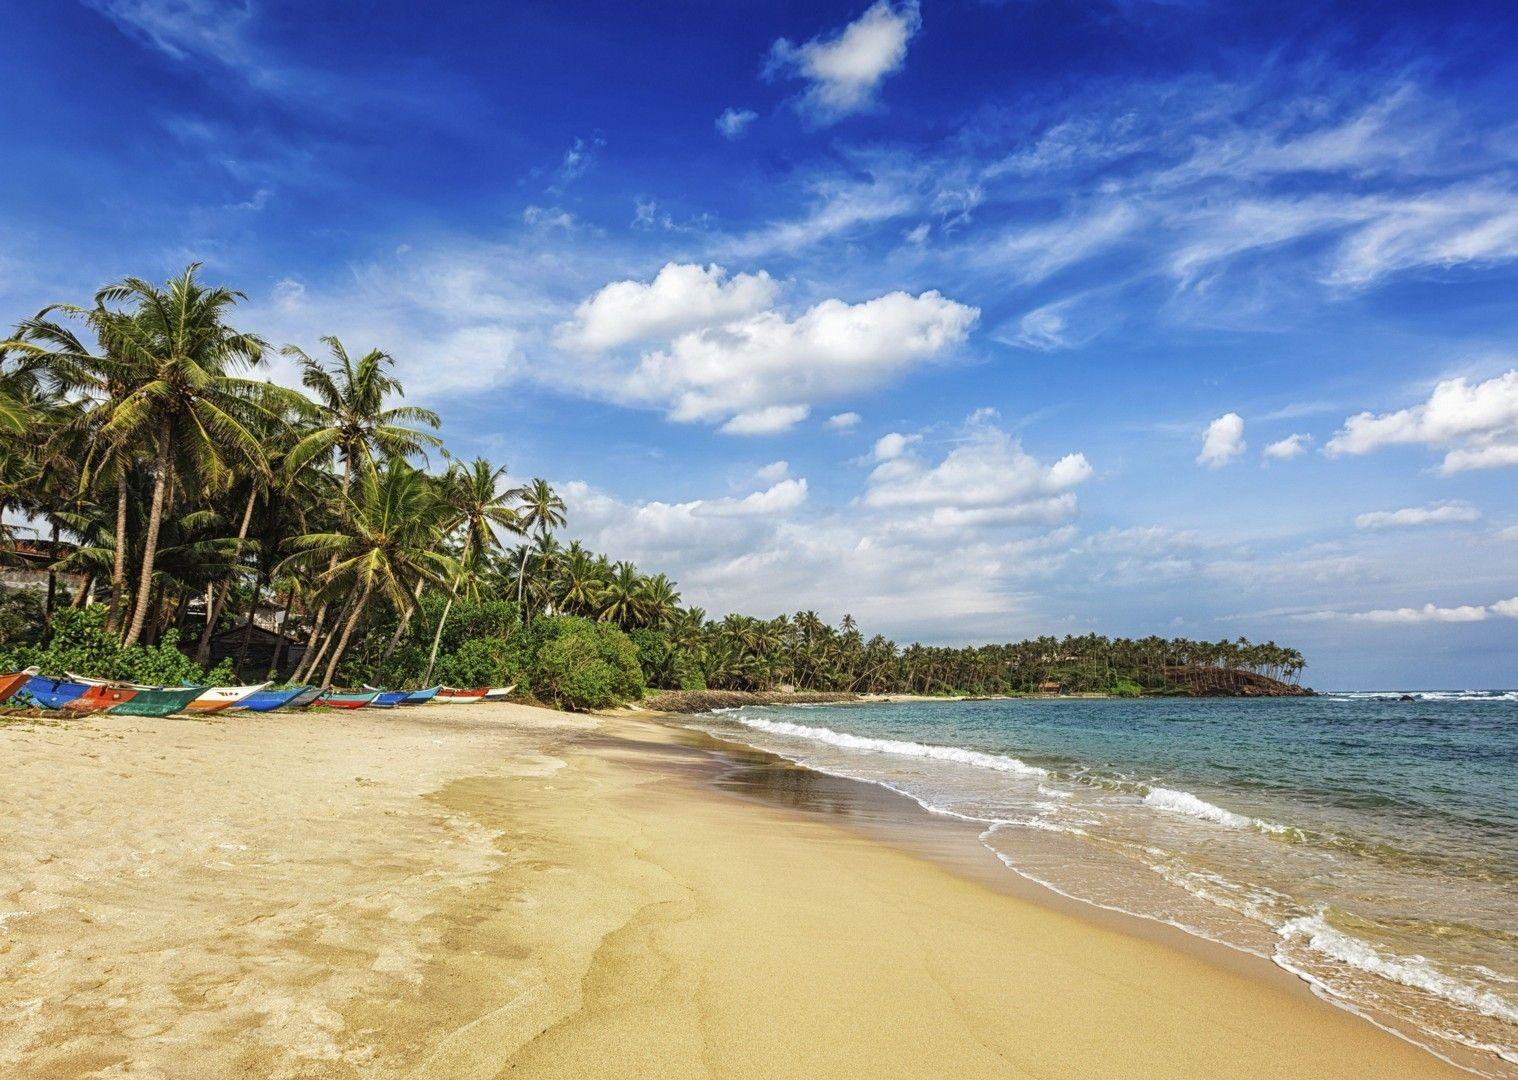 beach sri lanka.jpg - Sri Lanka - Meet the People Tours